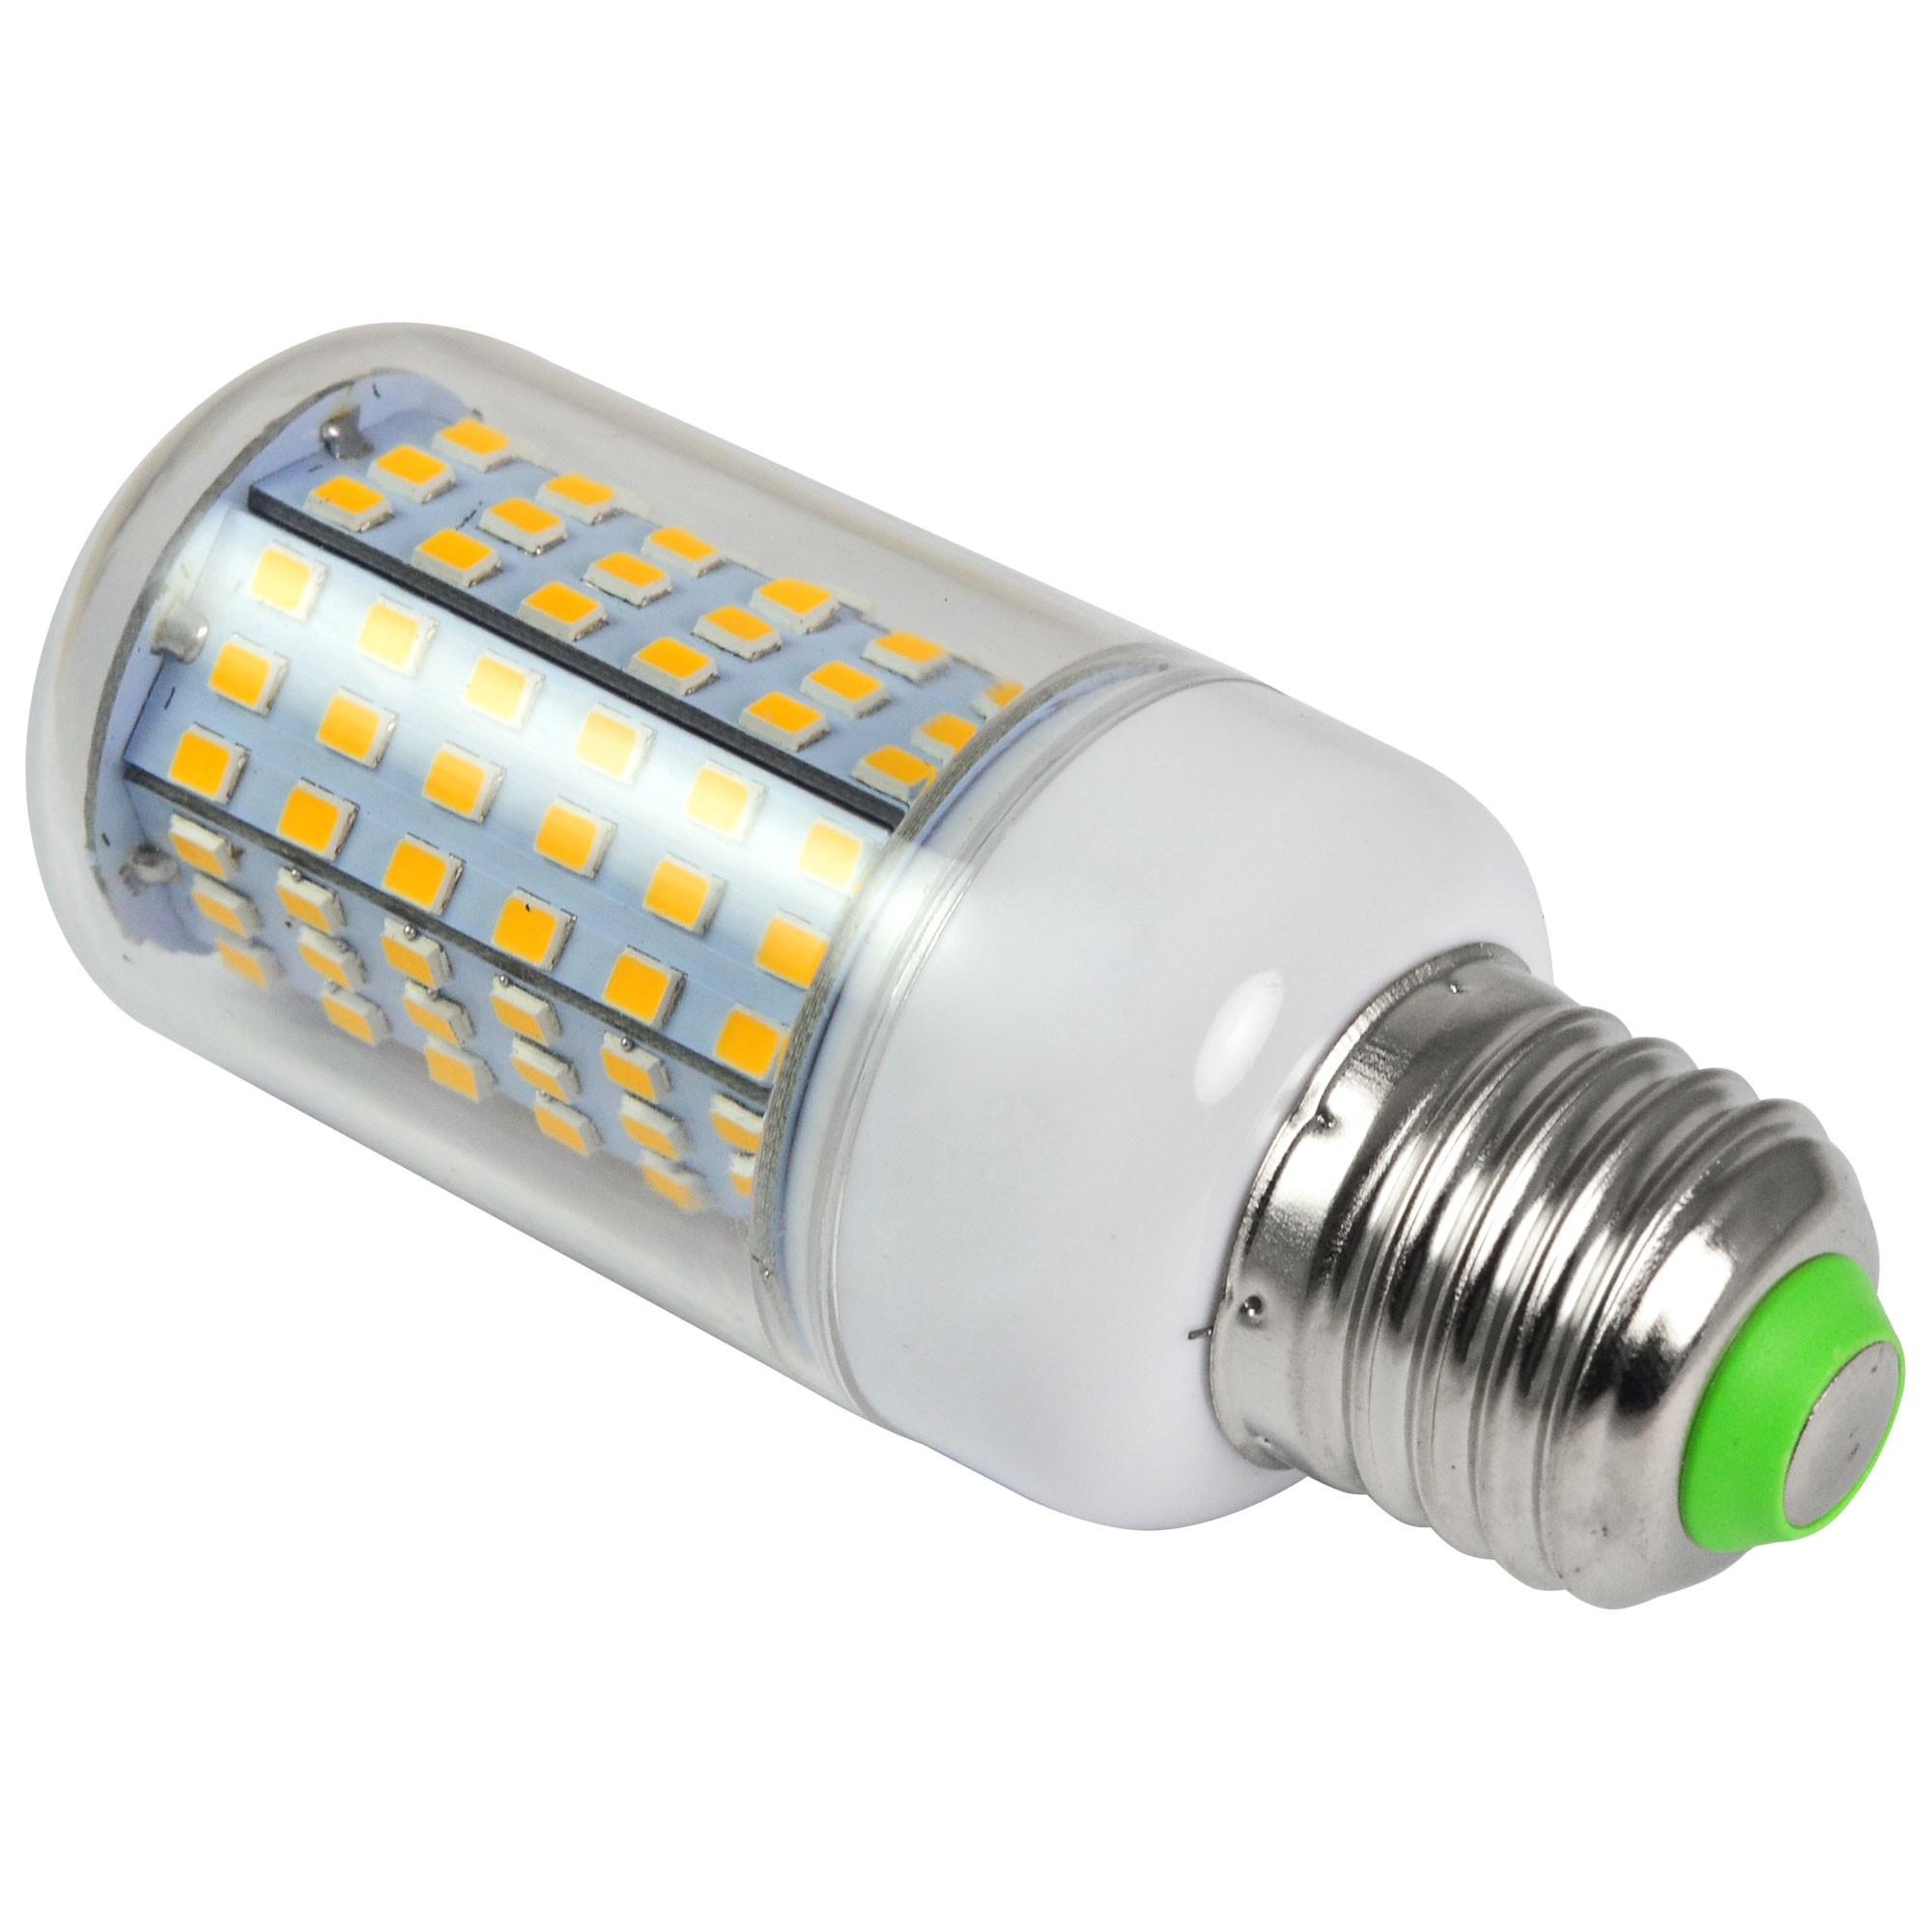 mengsled mengs e27 12w led corn light 126x 2835 smd leds led bulb ac 220 240v in warm white. Black Bedroom Furniture Sets. Home Design Ideas